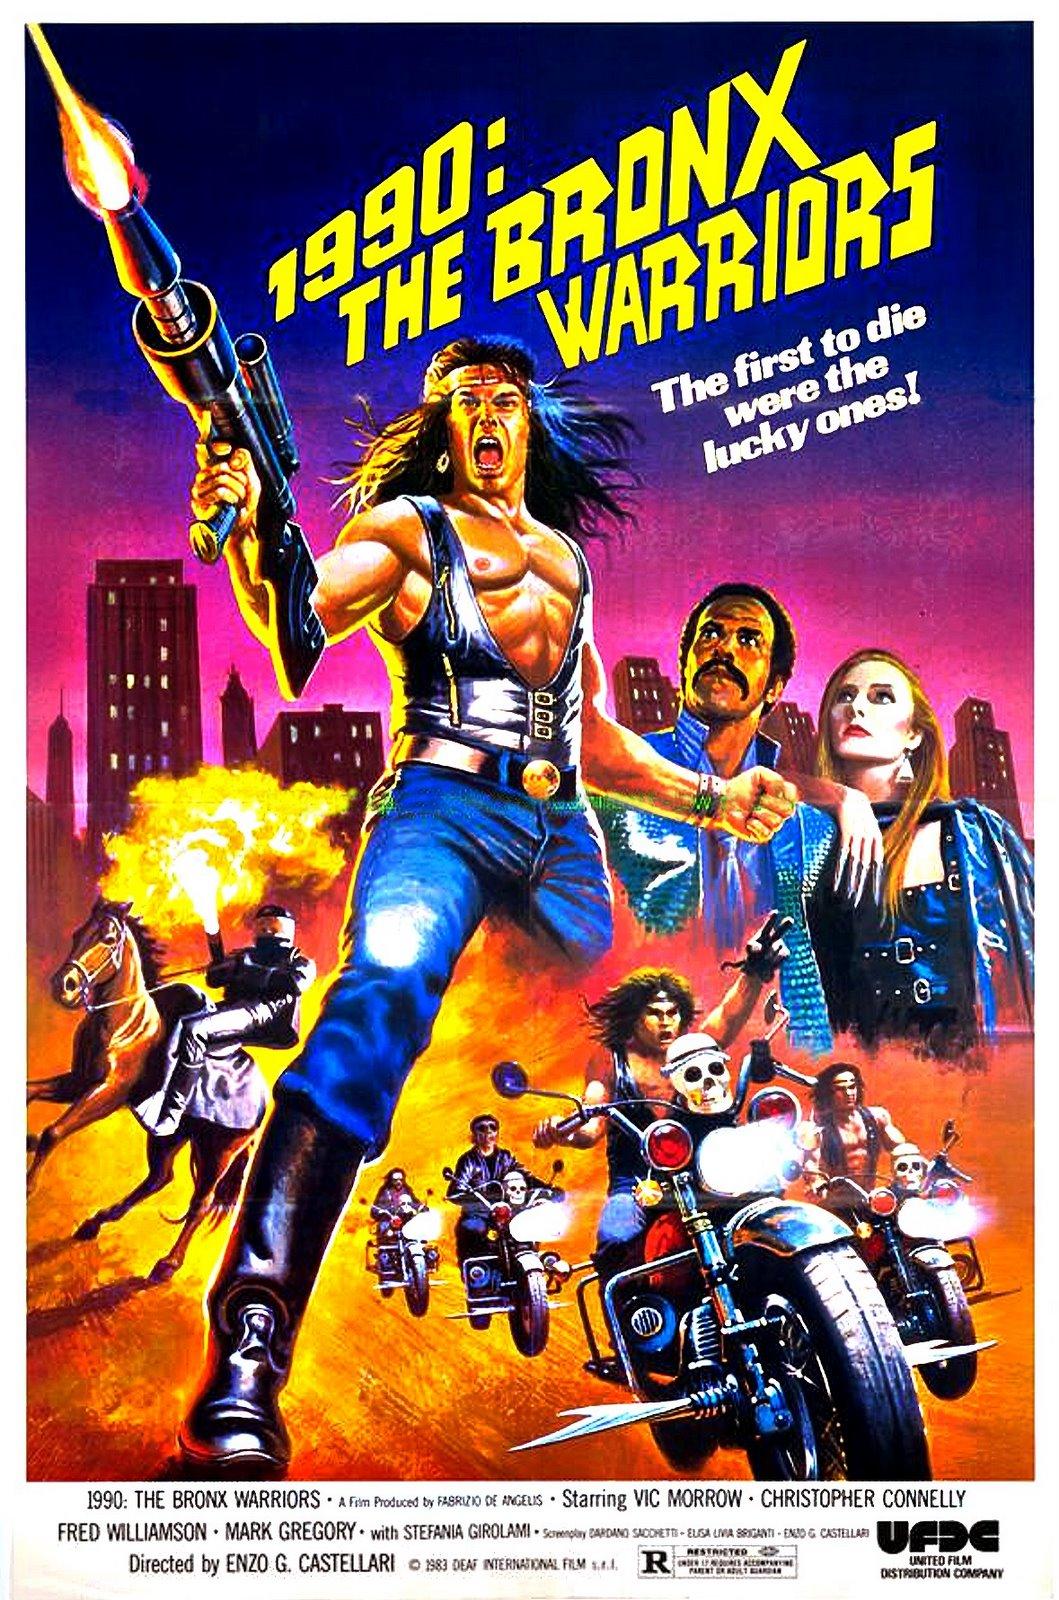 1990 : The Bronx Warriors (1982)